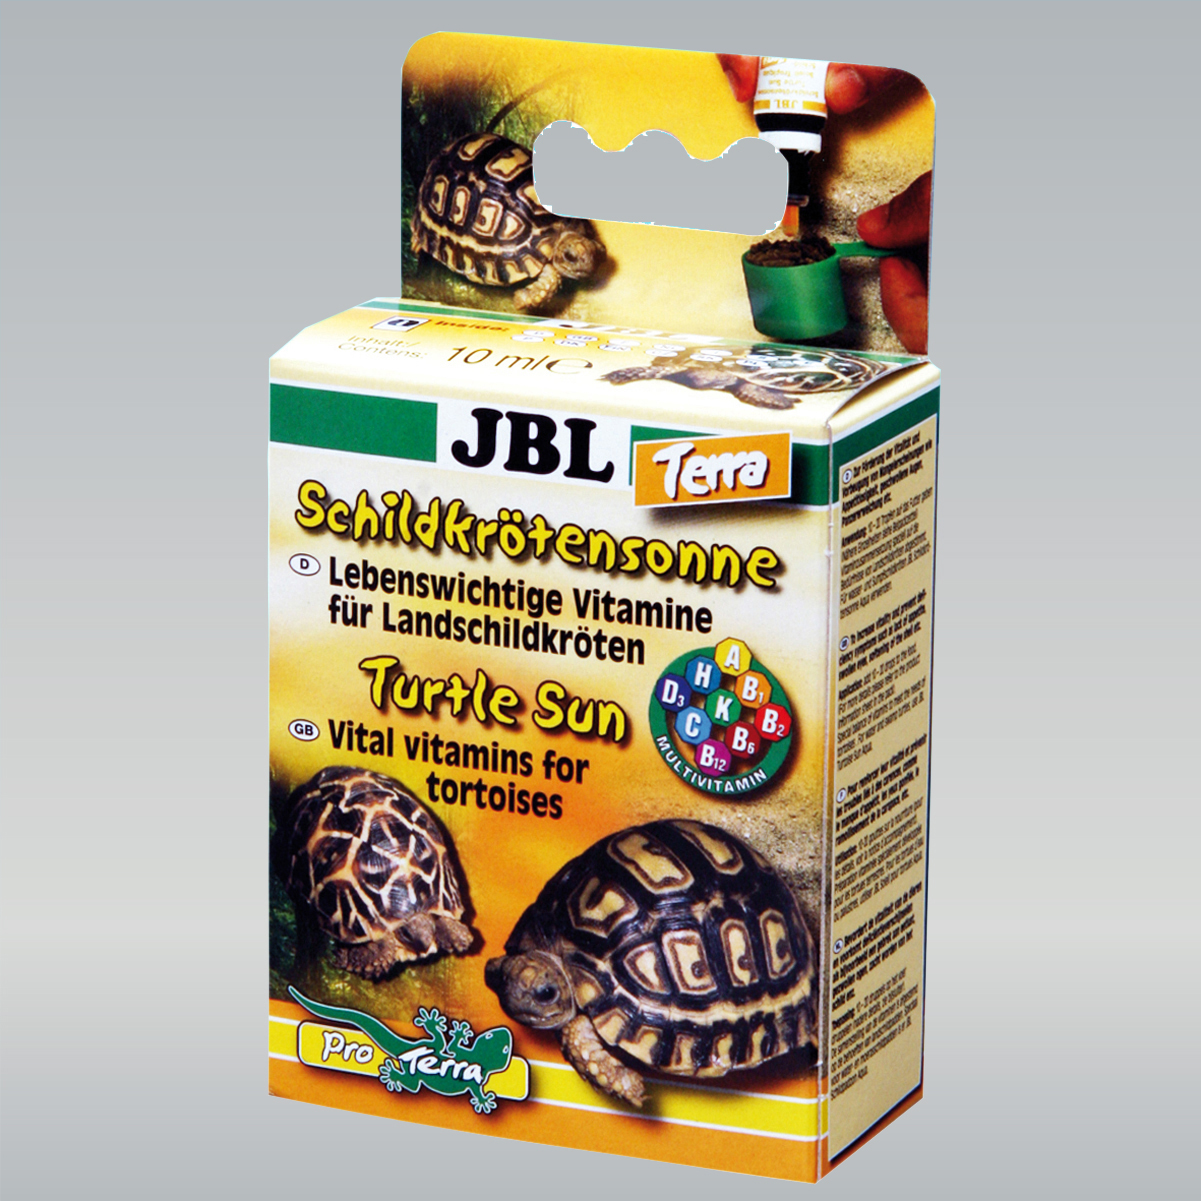 JBL Schildkrötensonne Terra 10 ml 7044200